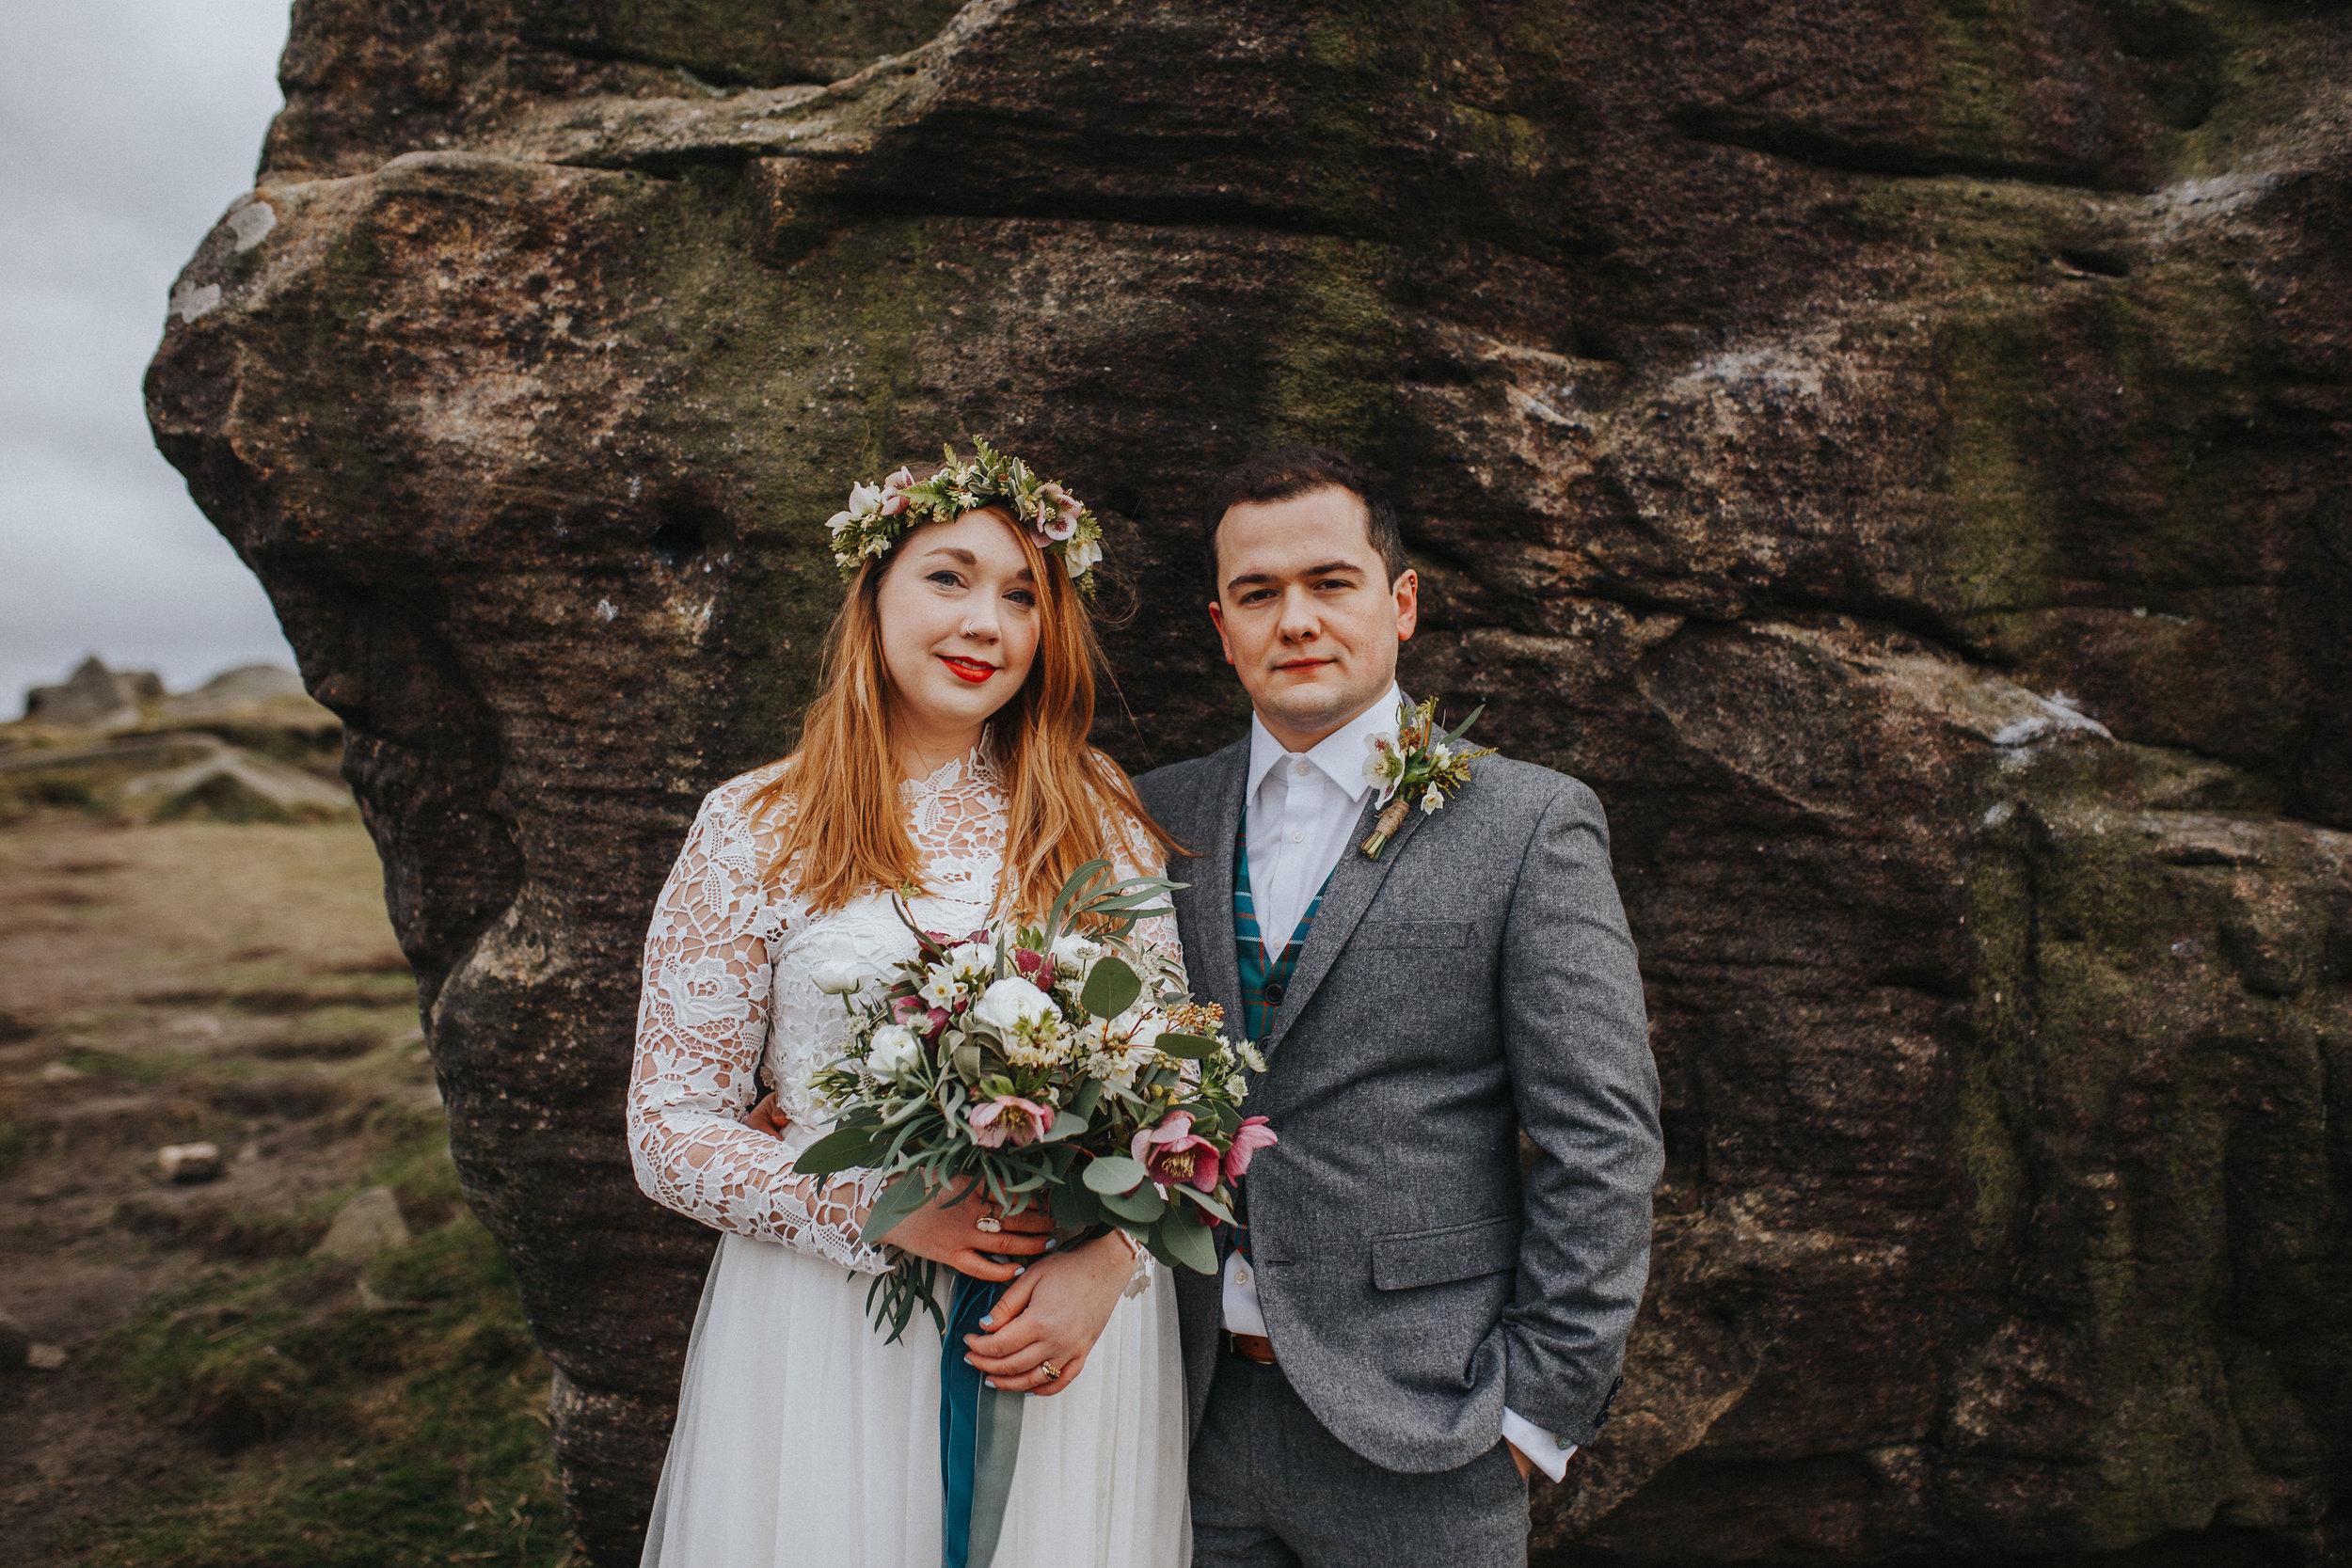 Rosie-bespoke-lace-long sleeved-tulle-wedding-dress-winter-peak district-susanna greening-13.jpg